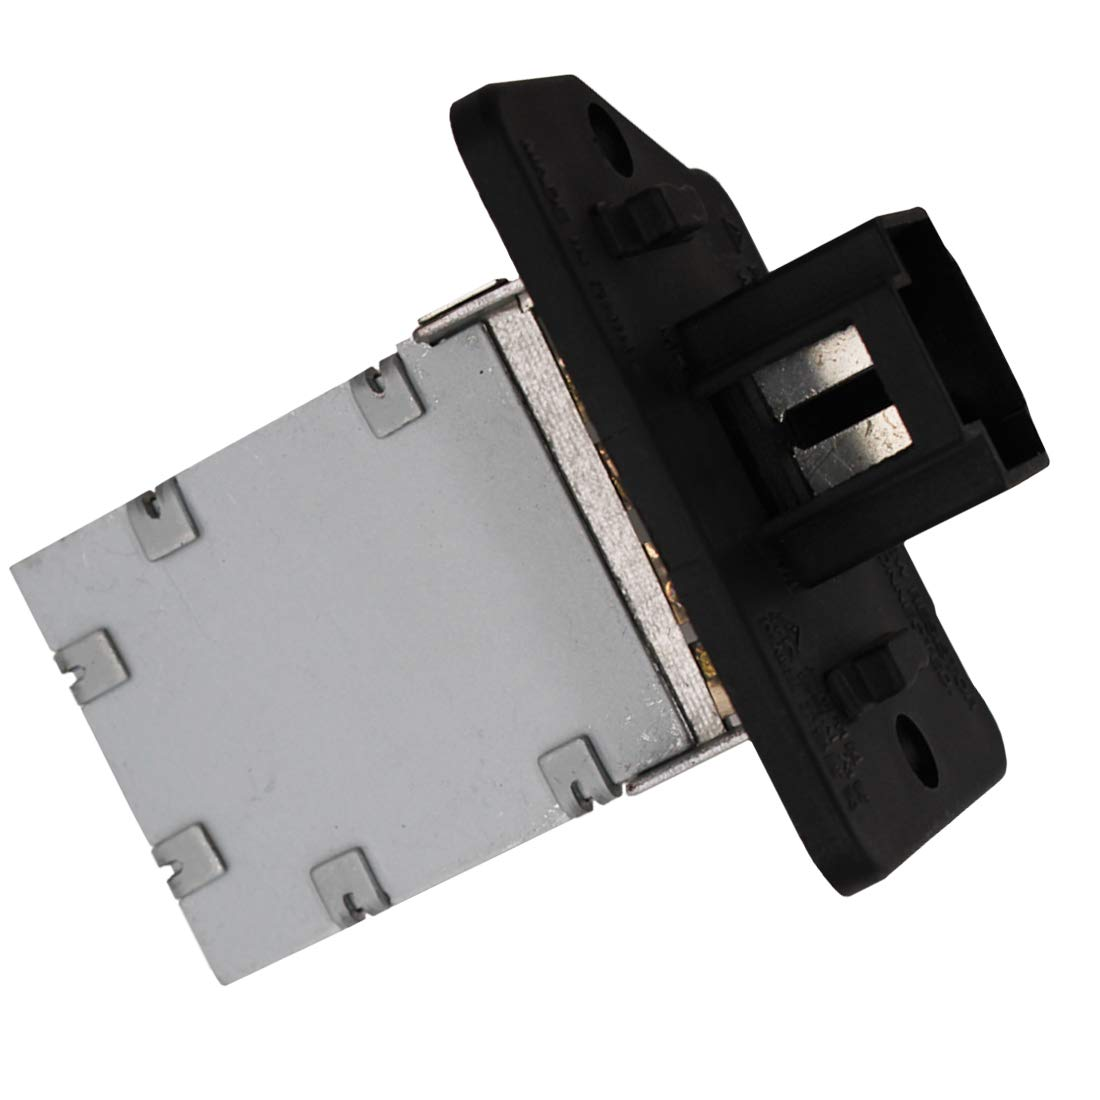 HZYCKJ Car Blower Motor Resistor Replacement OEM # 97128-3K000